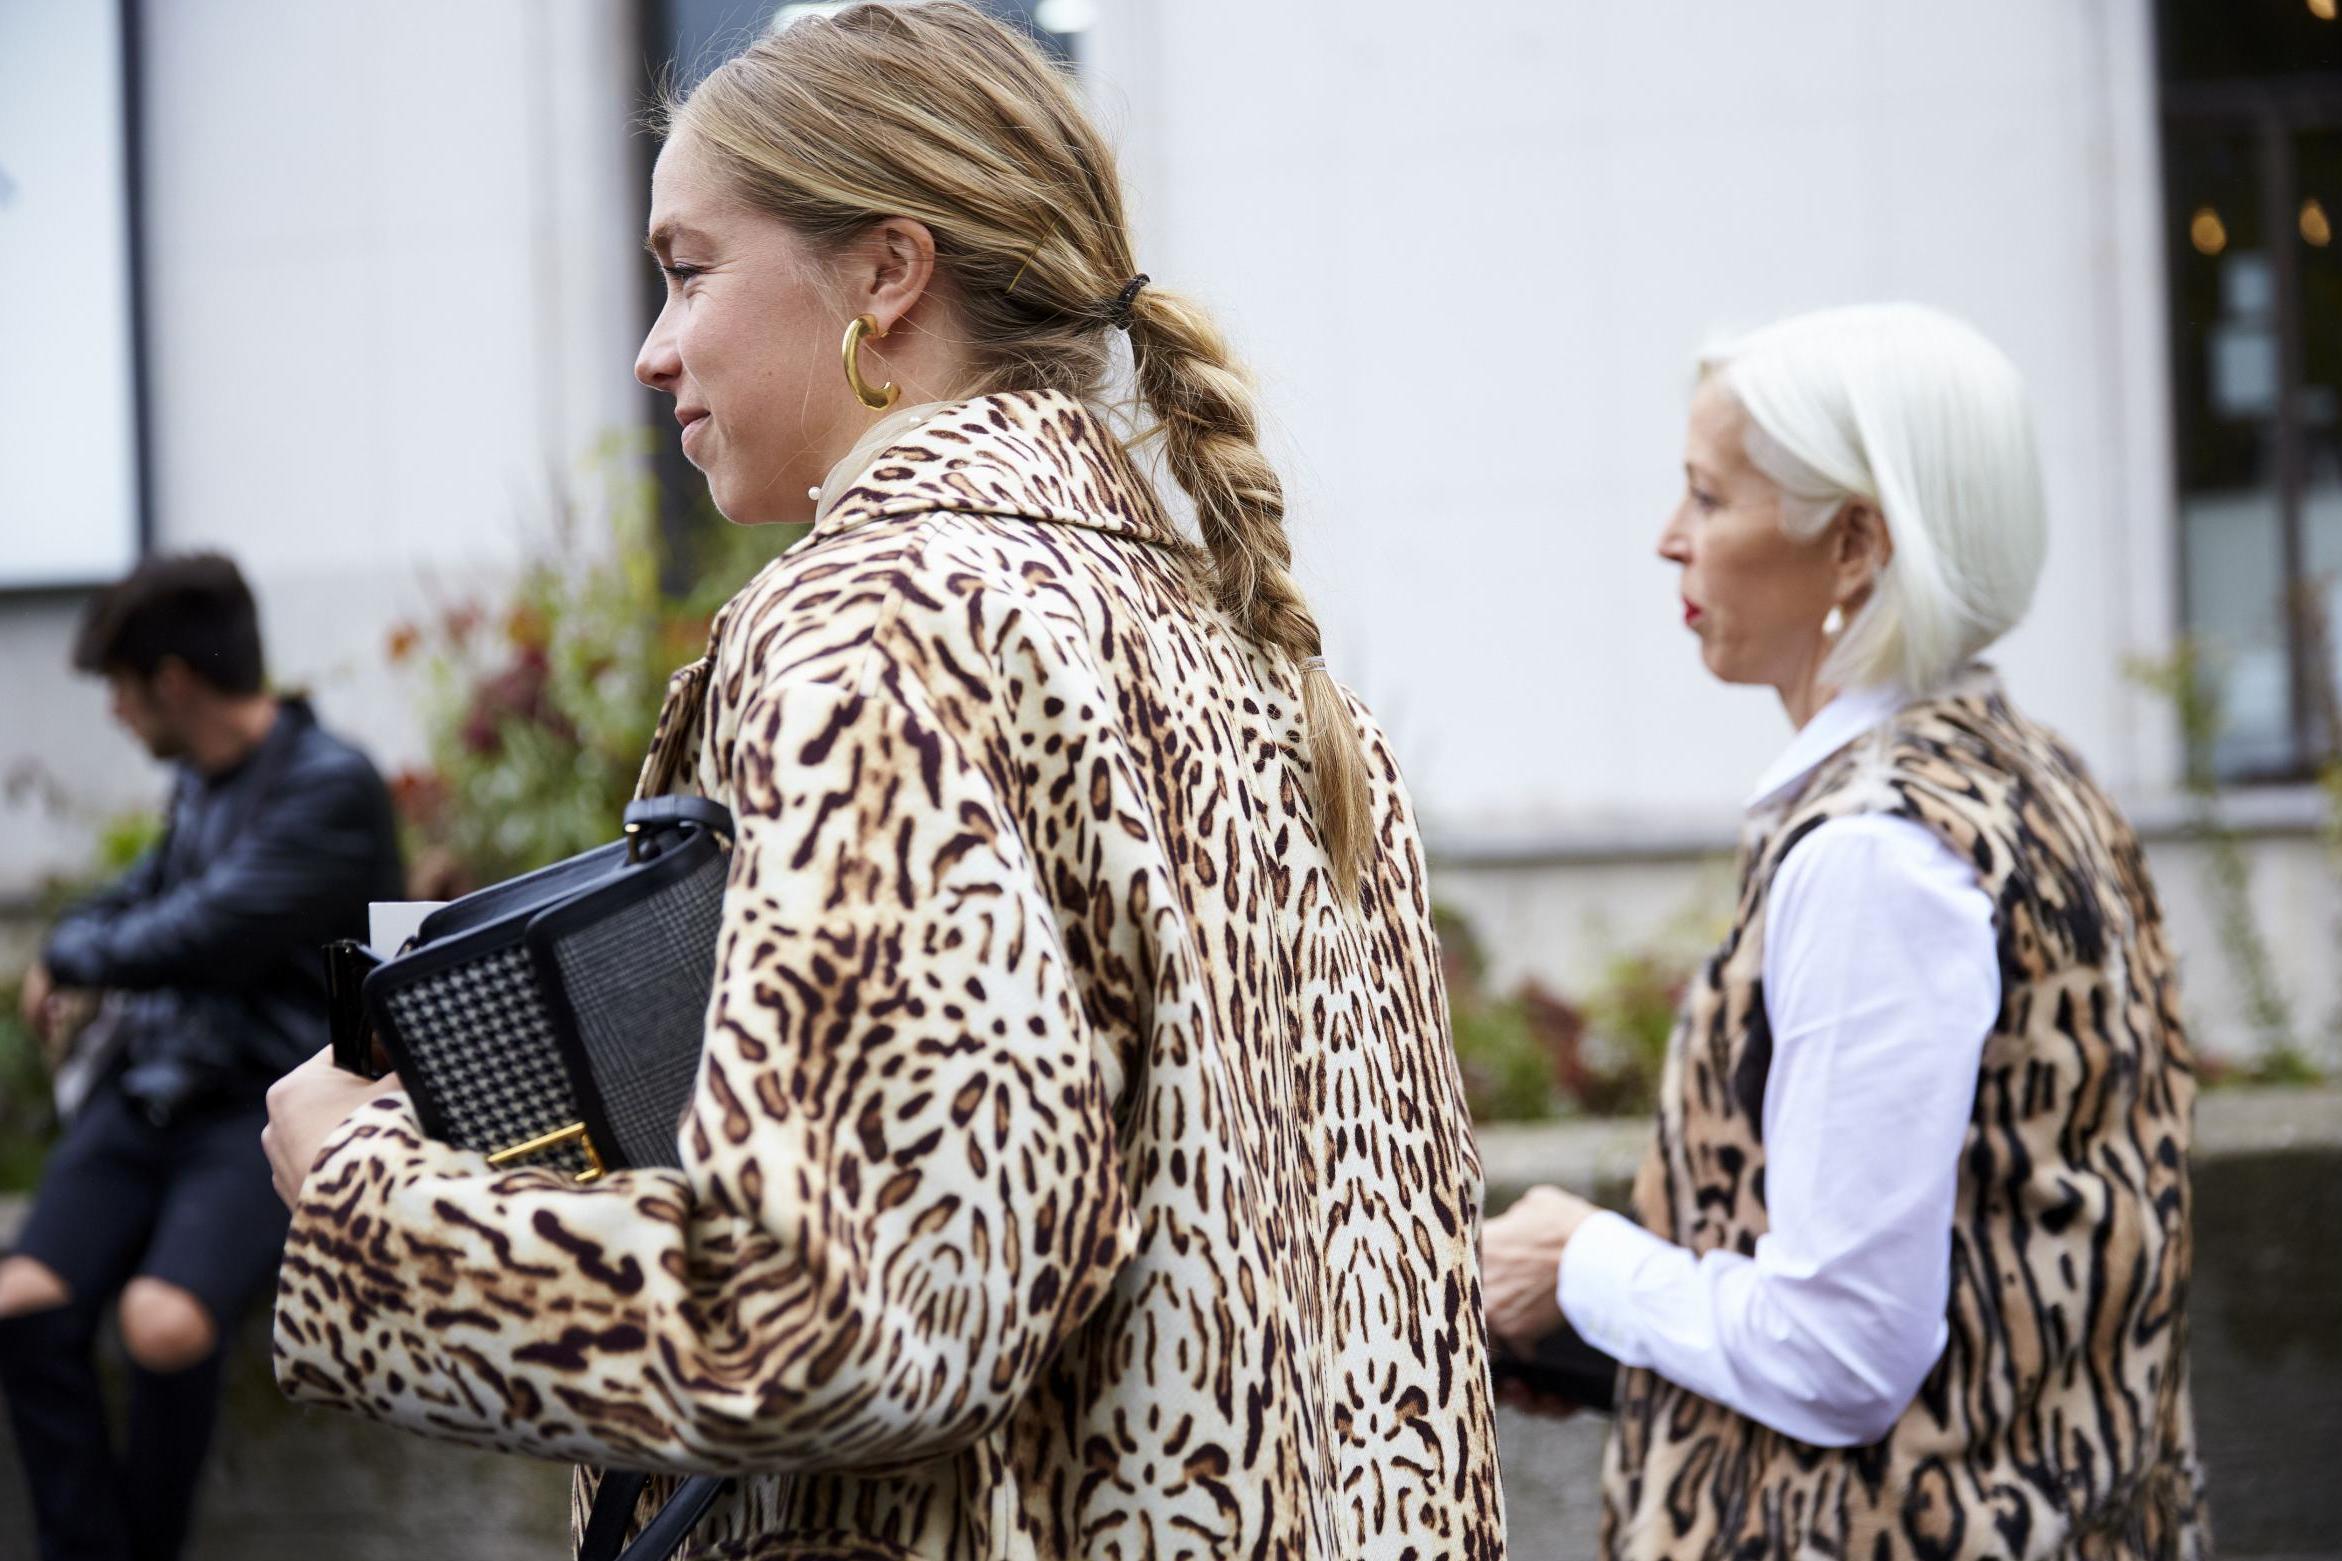 street-style-mfw-leopard-print-coat-0